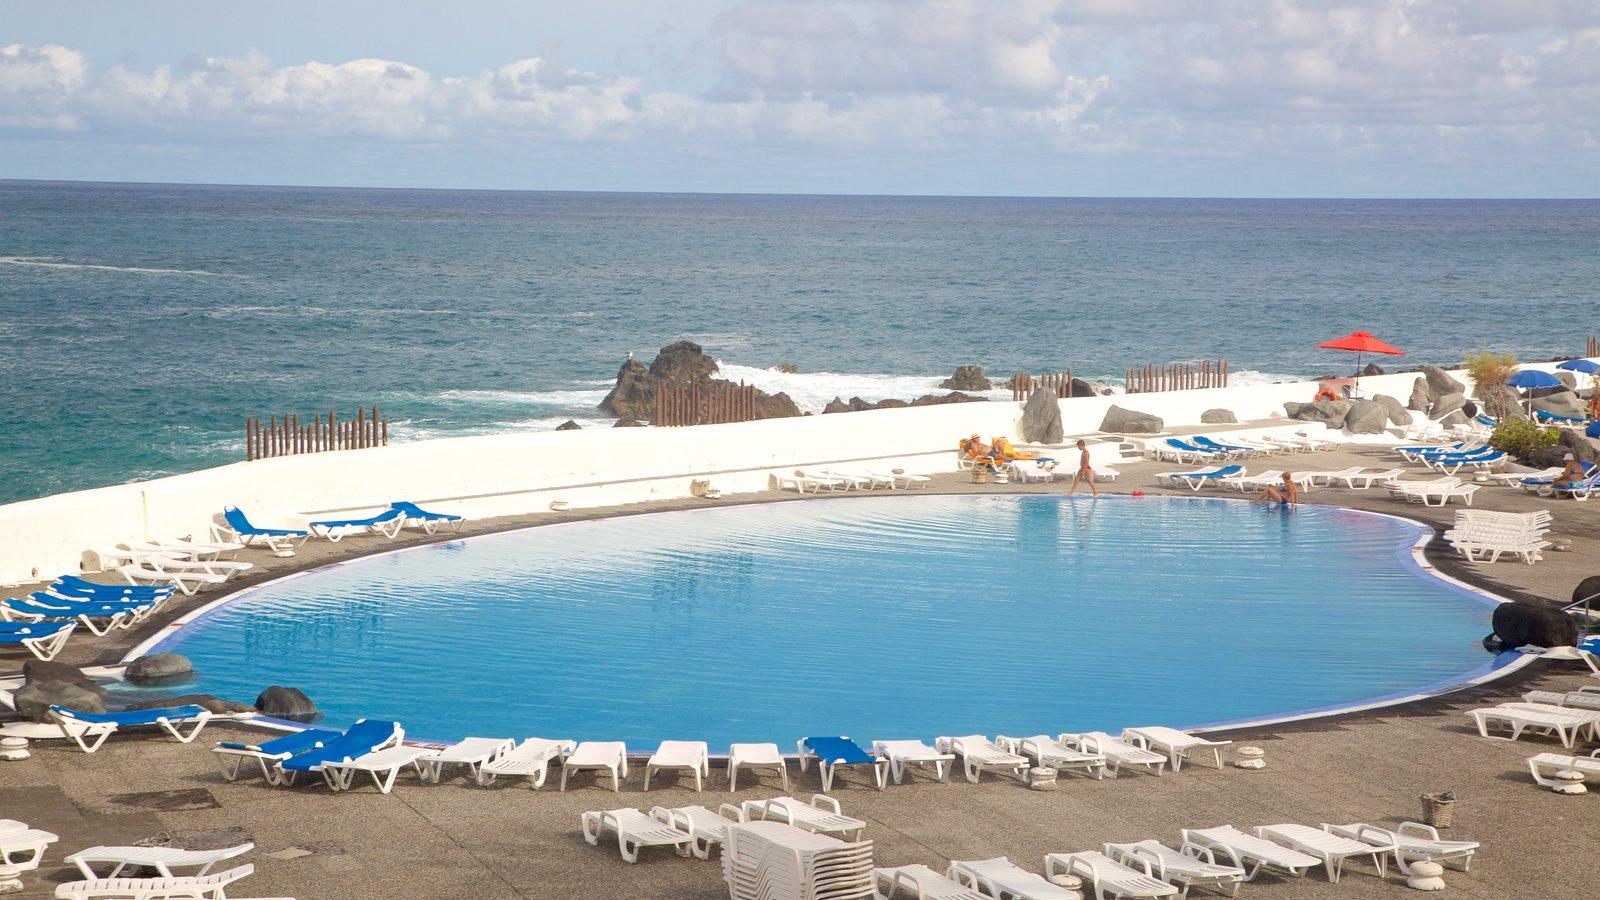 Fotos de piscinas del lago marti nez ver fotos e im genes for Imagenes de piscinas